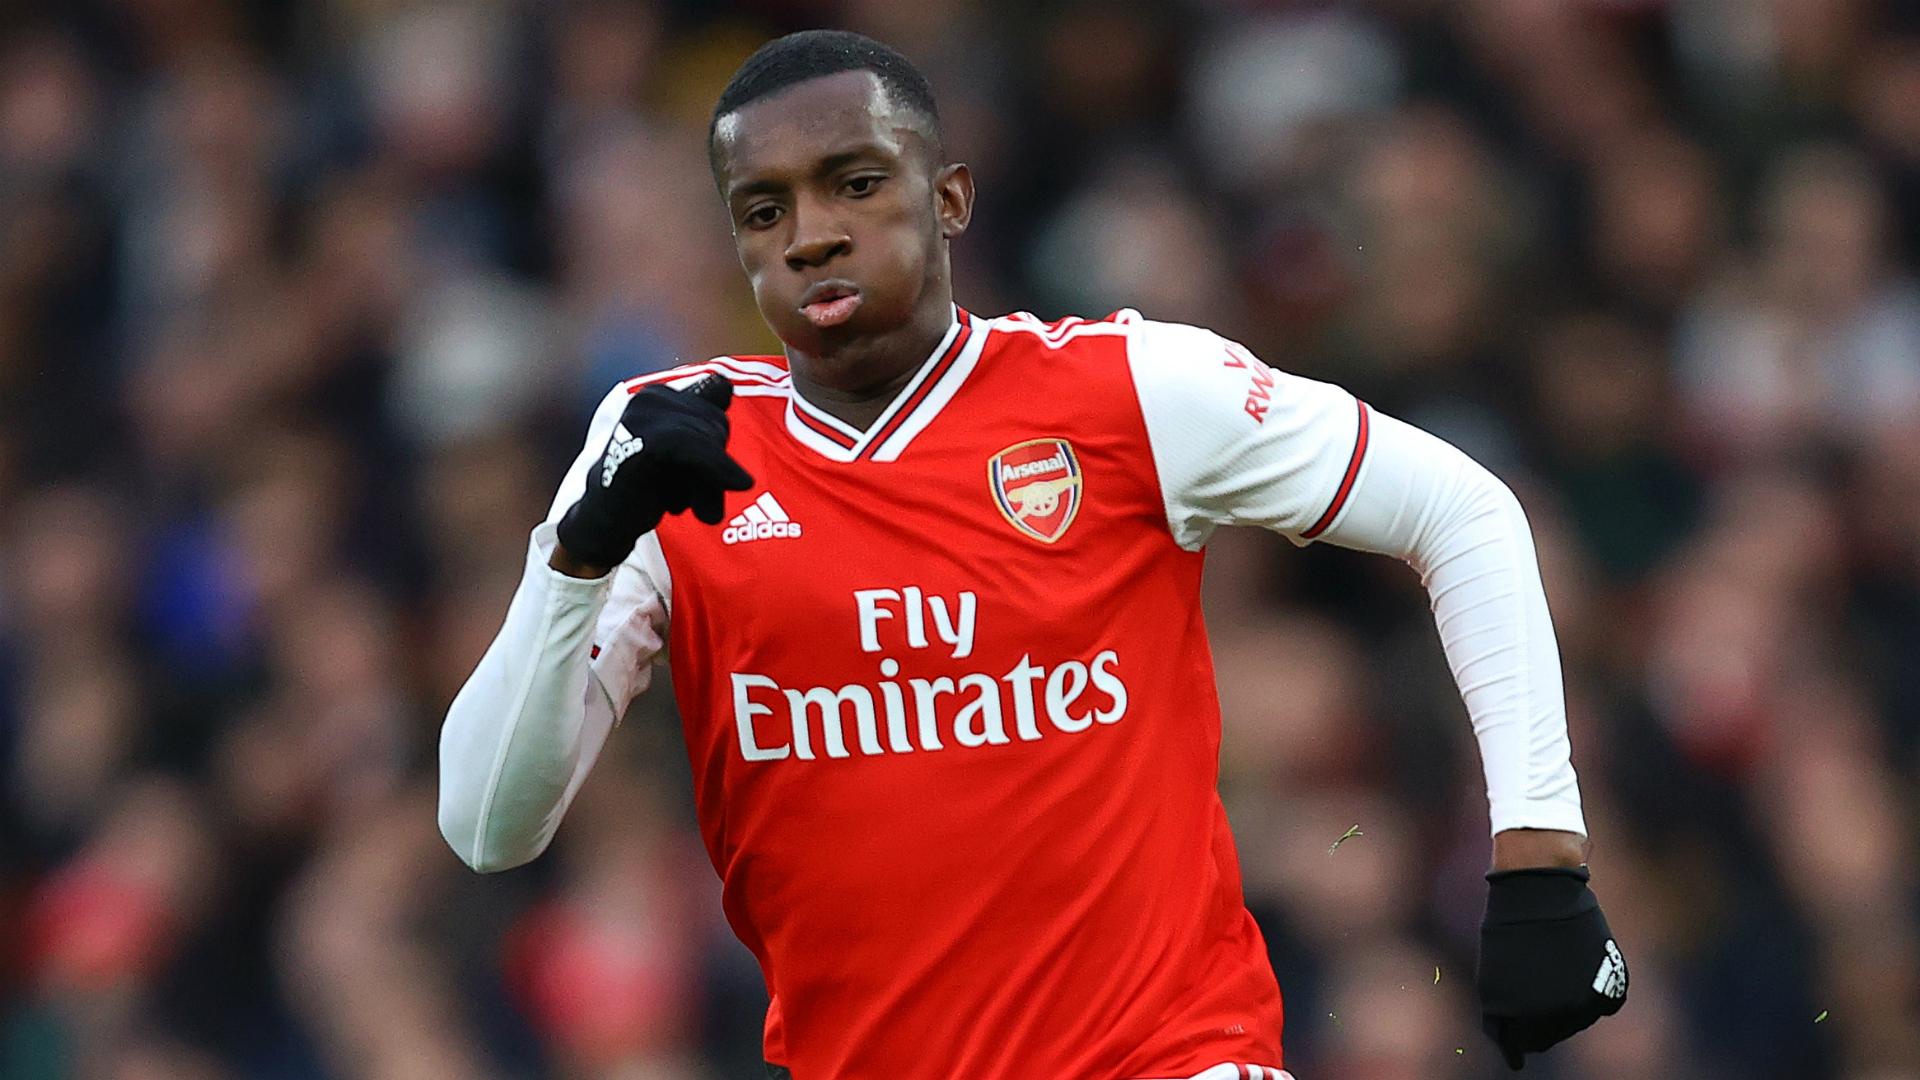 Eddie Nketiah scores hat-trick as Arsenal return with 6-0 win over Charlton